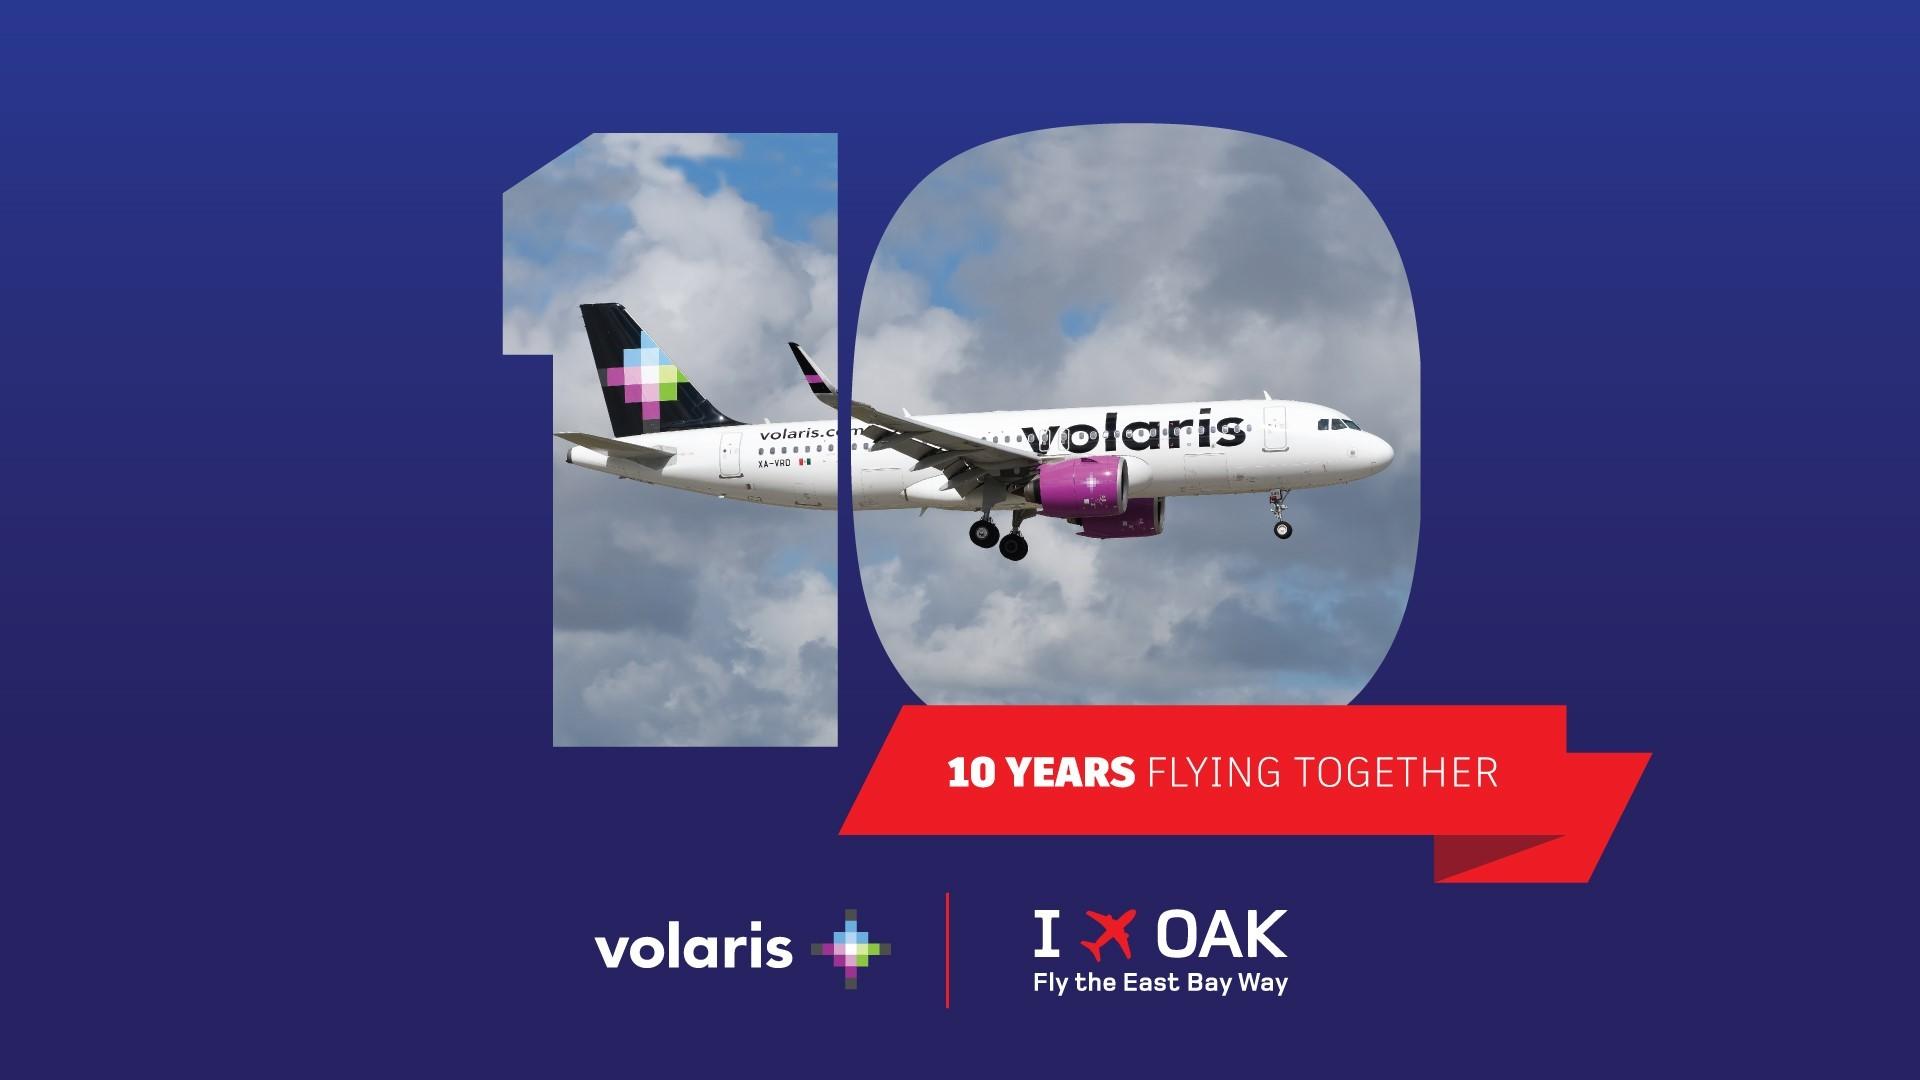 Volaris 10 Year